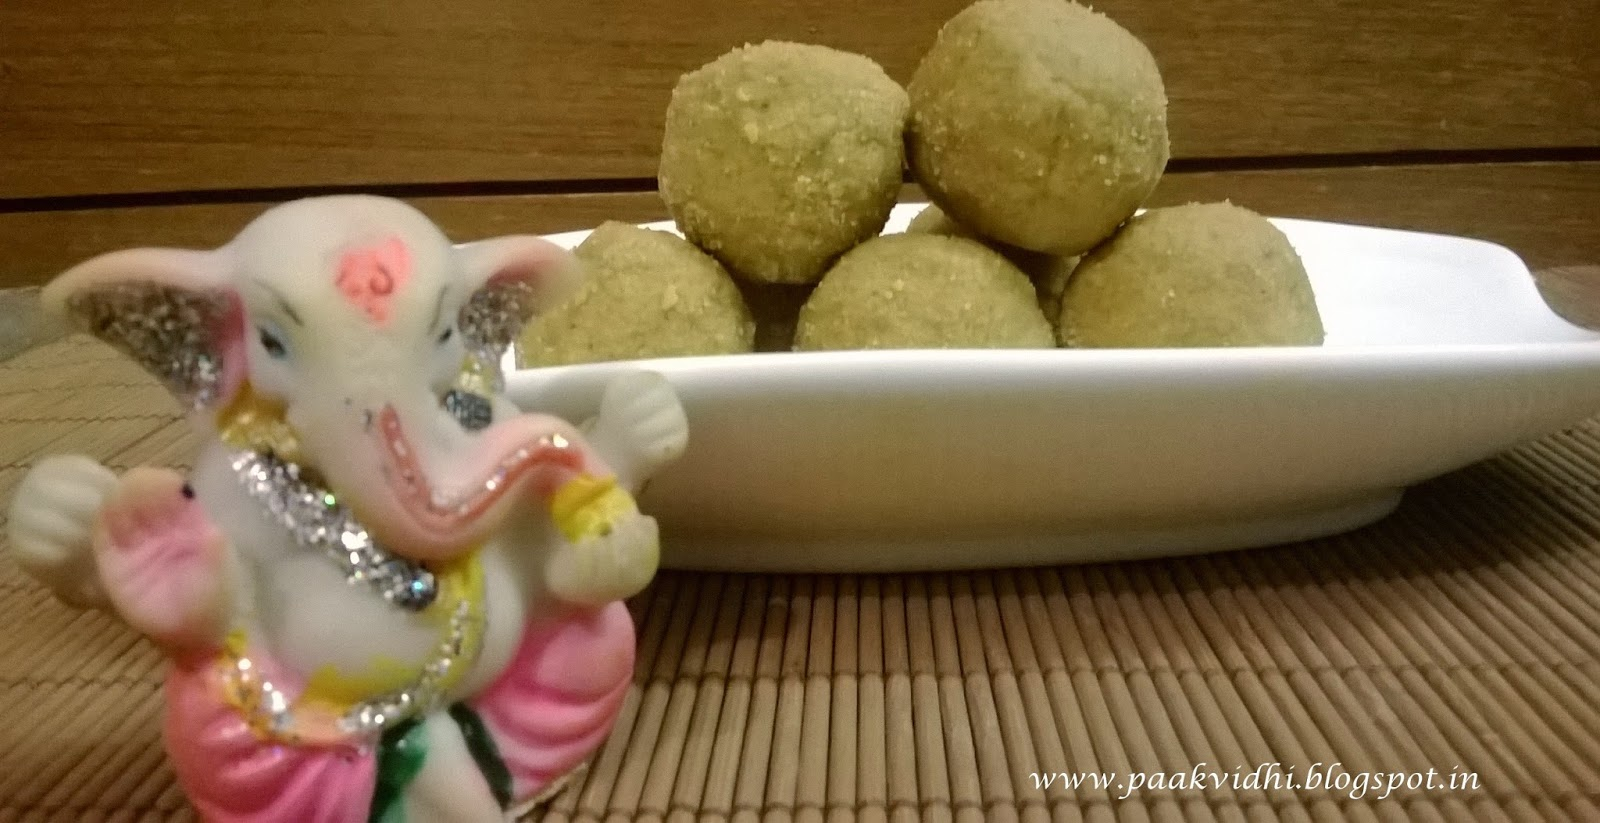 http://paakvidhi.blogspot.in/2014/03/besan-ke-laddu.html